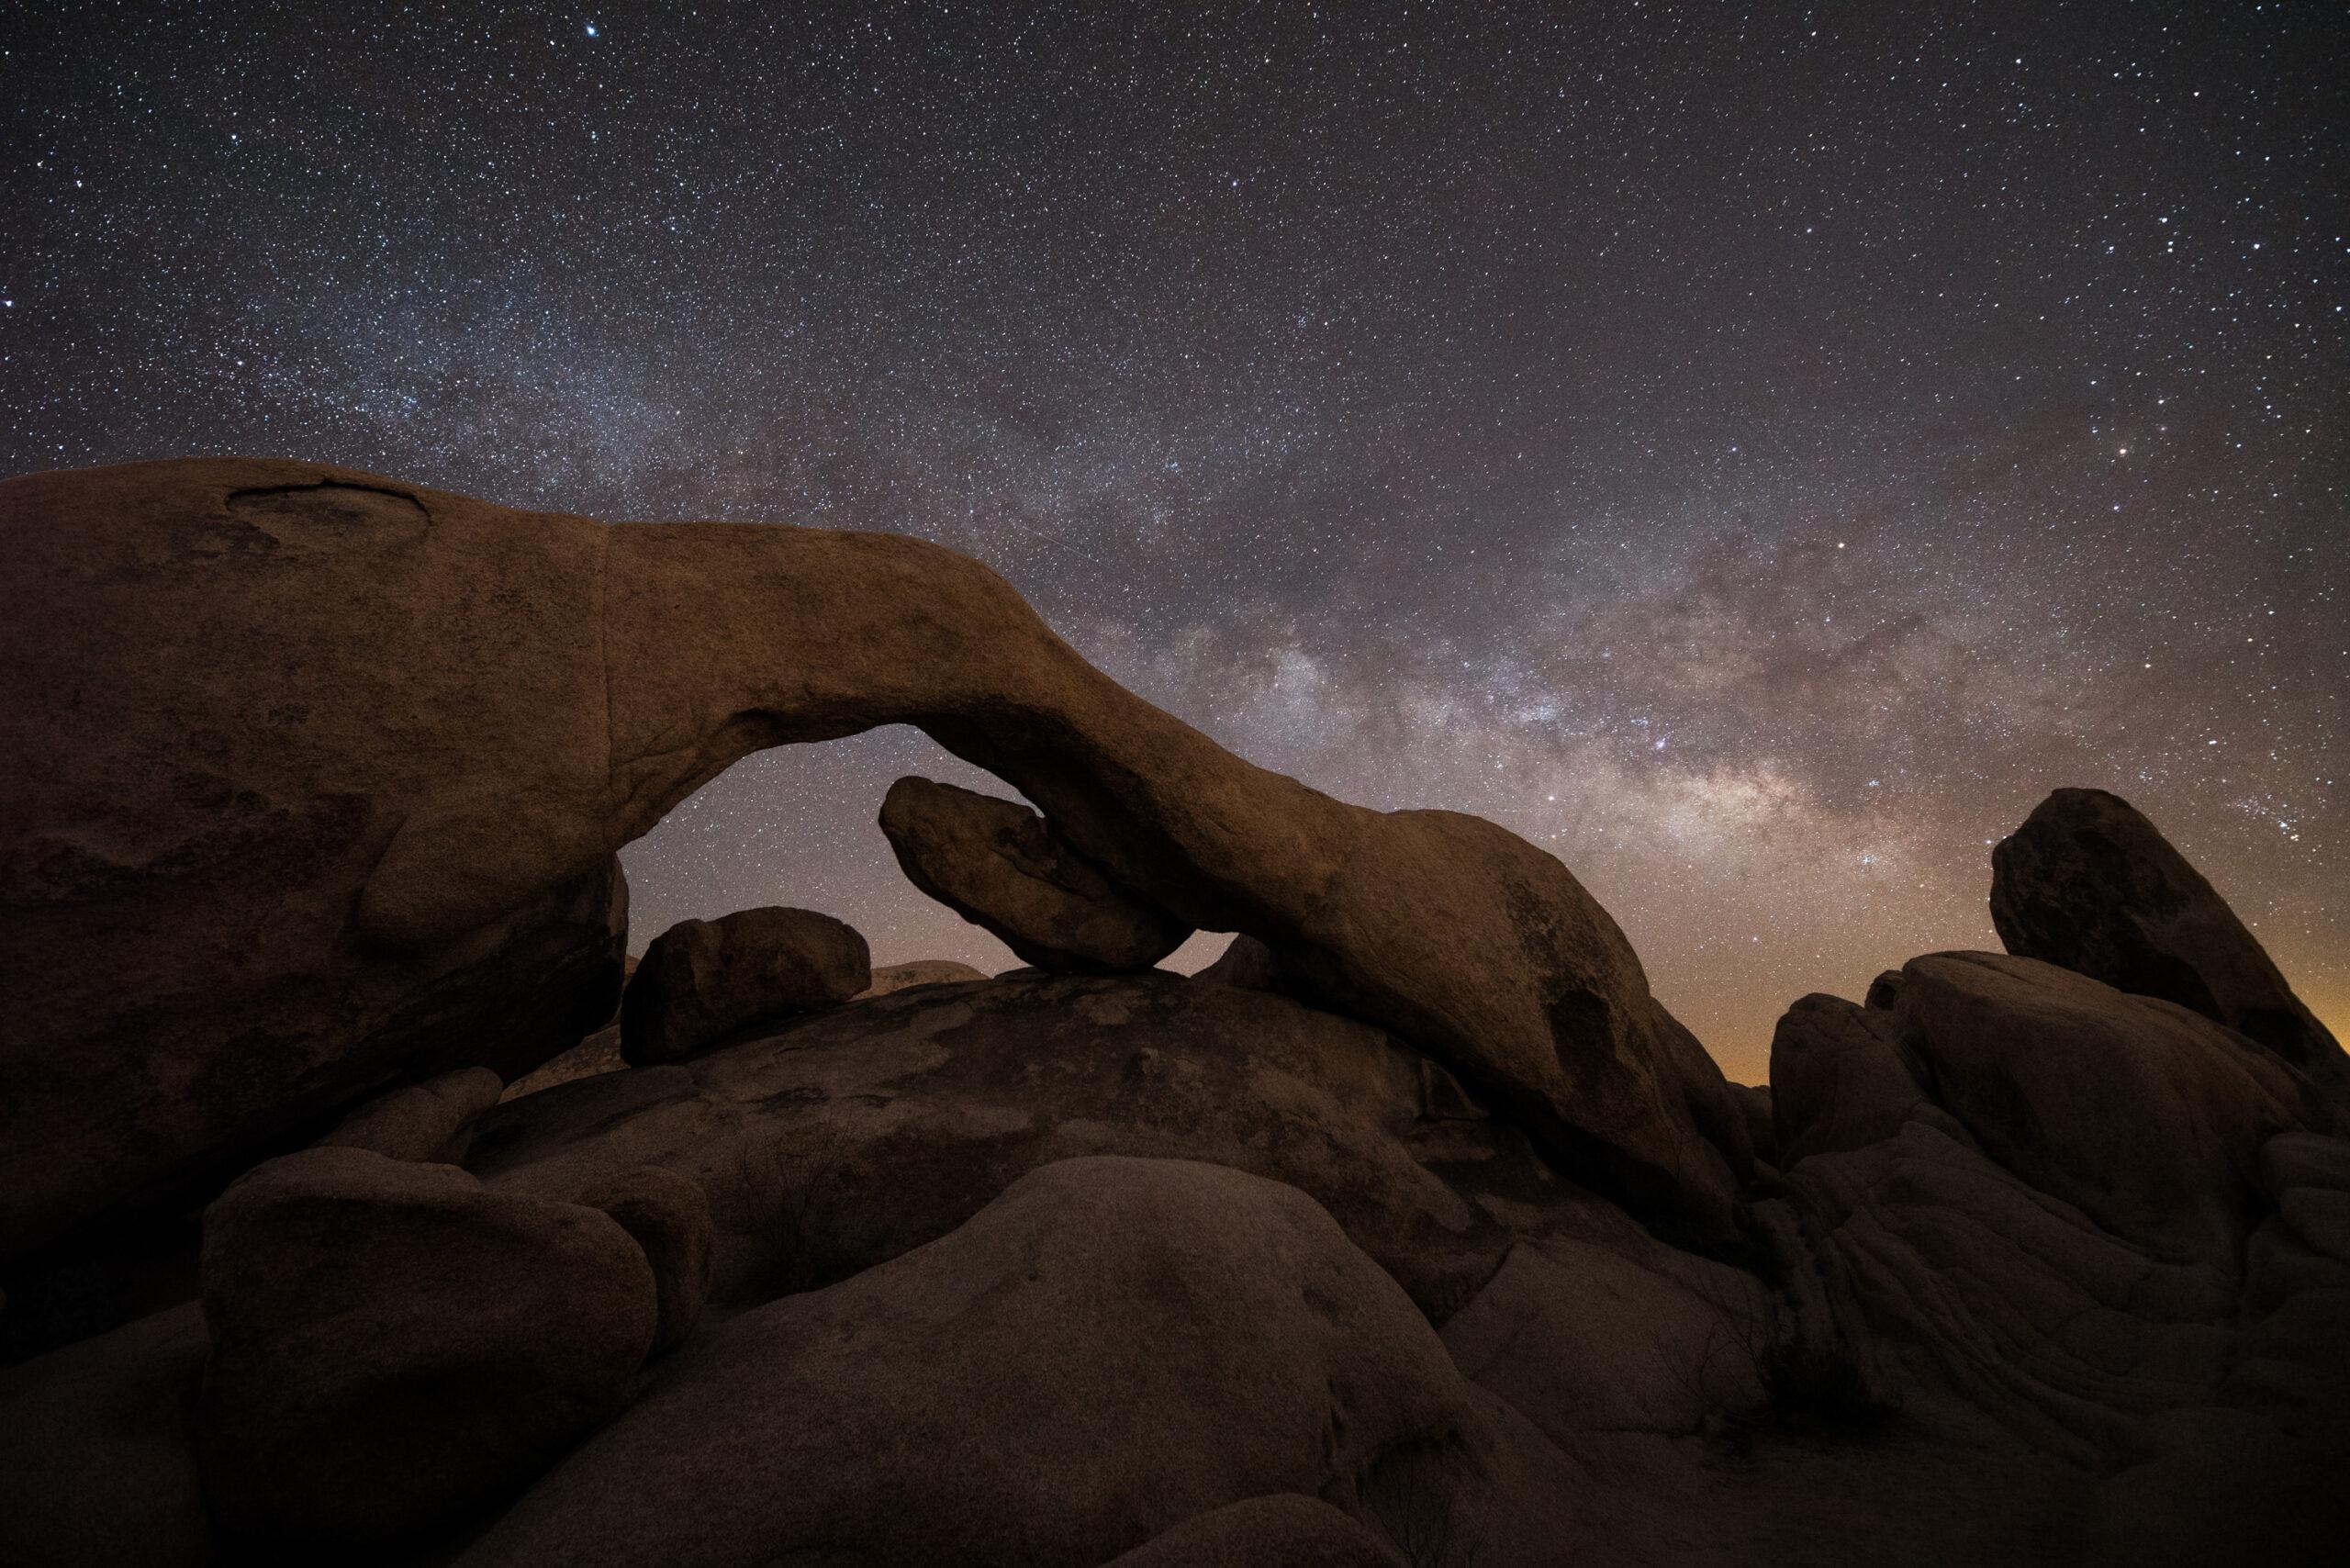 Jack Fusco - Joshua Tree Arch Rock Milky Way